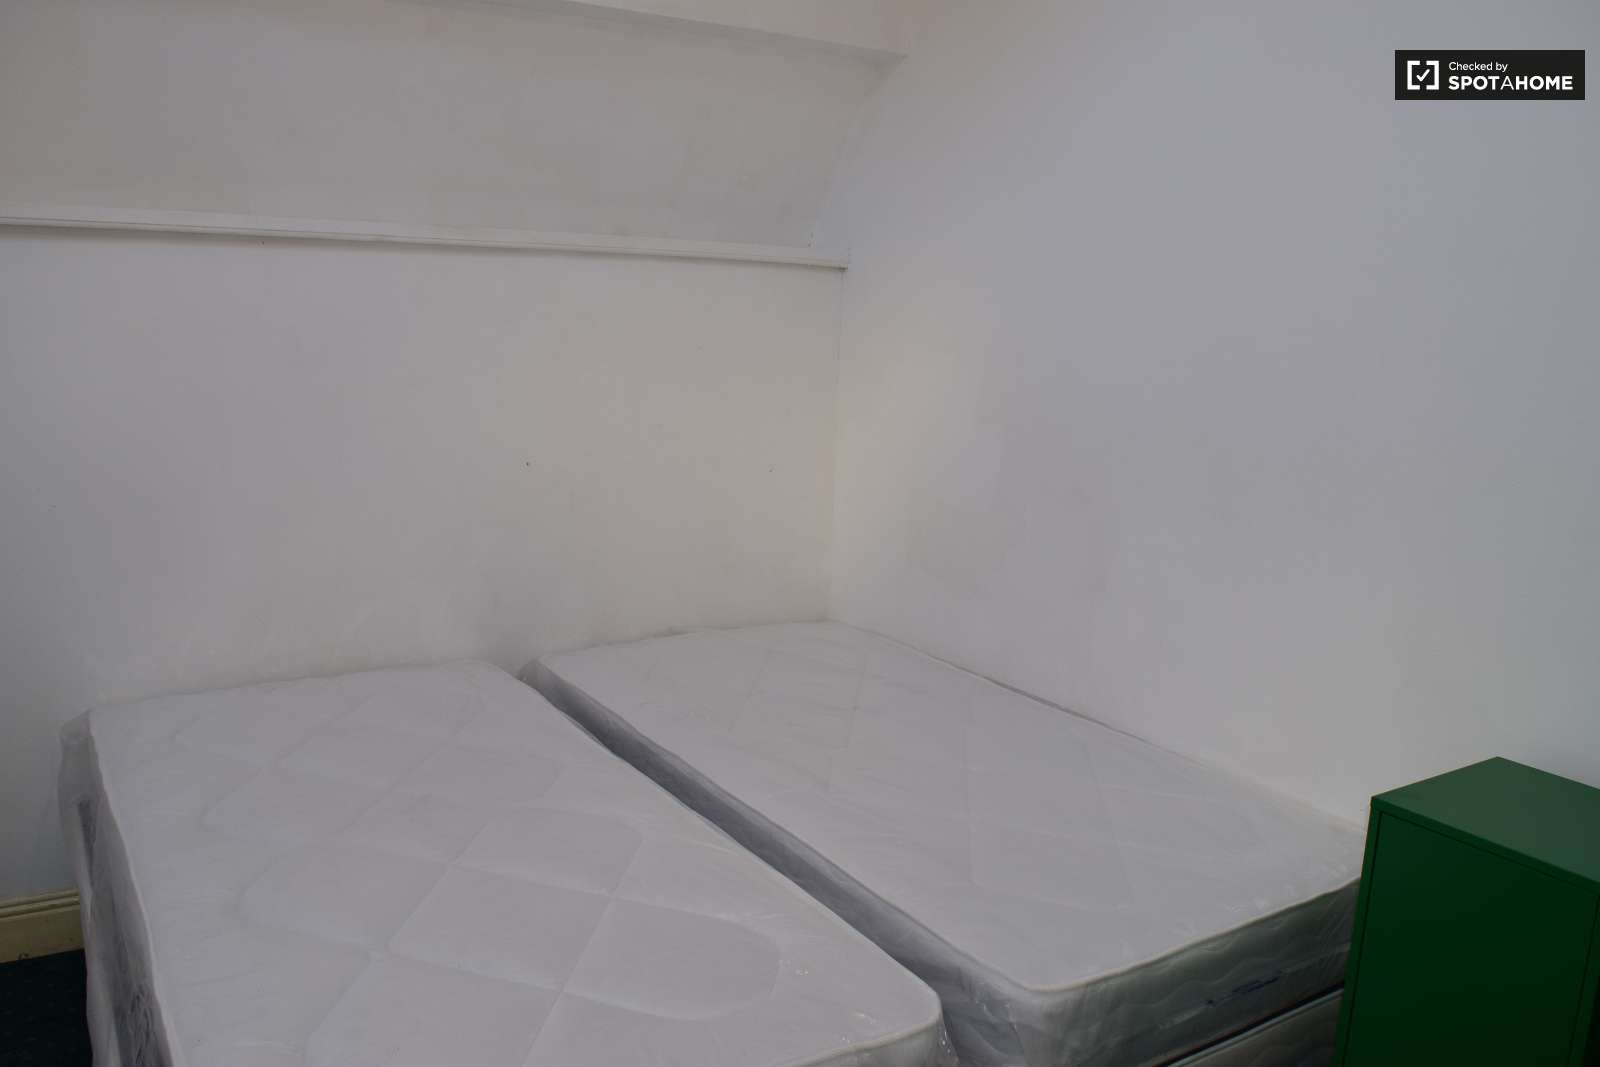 Bedroom. Ample room in 2 bedroom apartment in Drumcondra  Dublin  ref